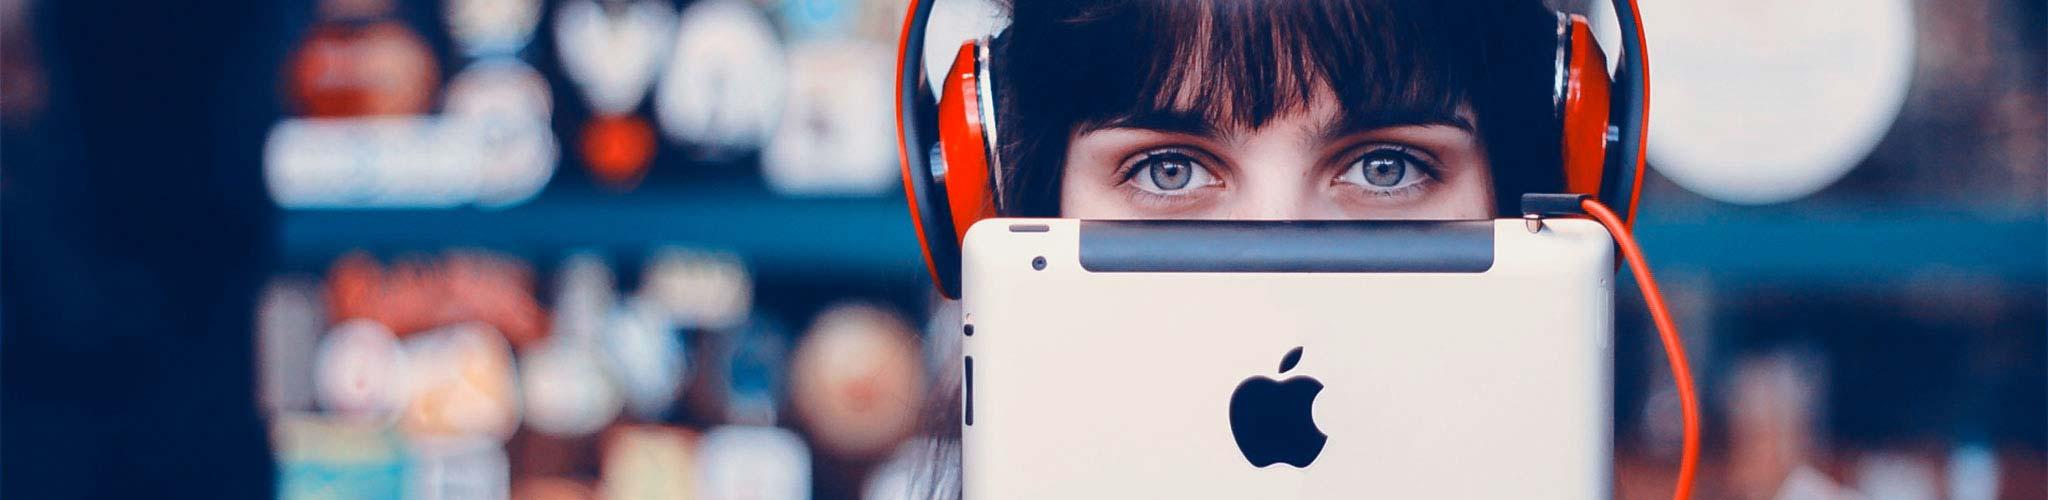 iPad Schulung, Kurs und Training mit mindsup.de